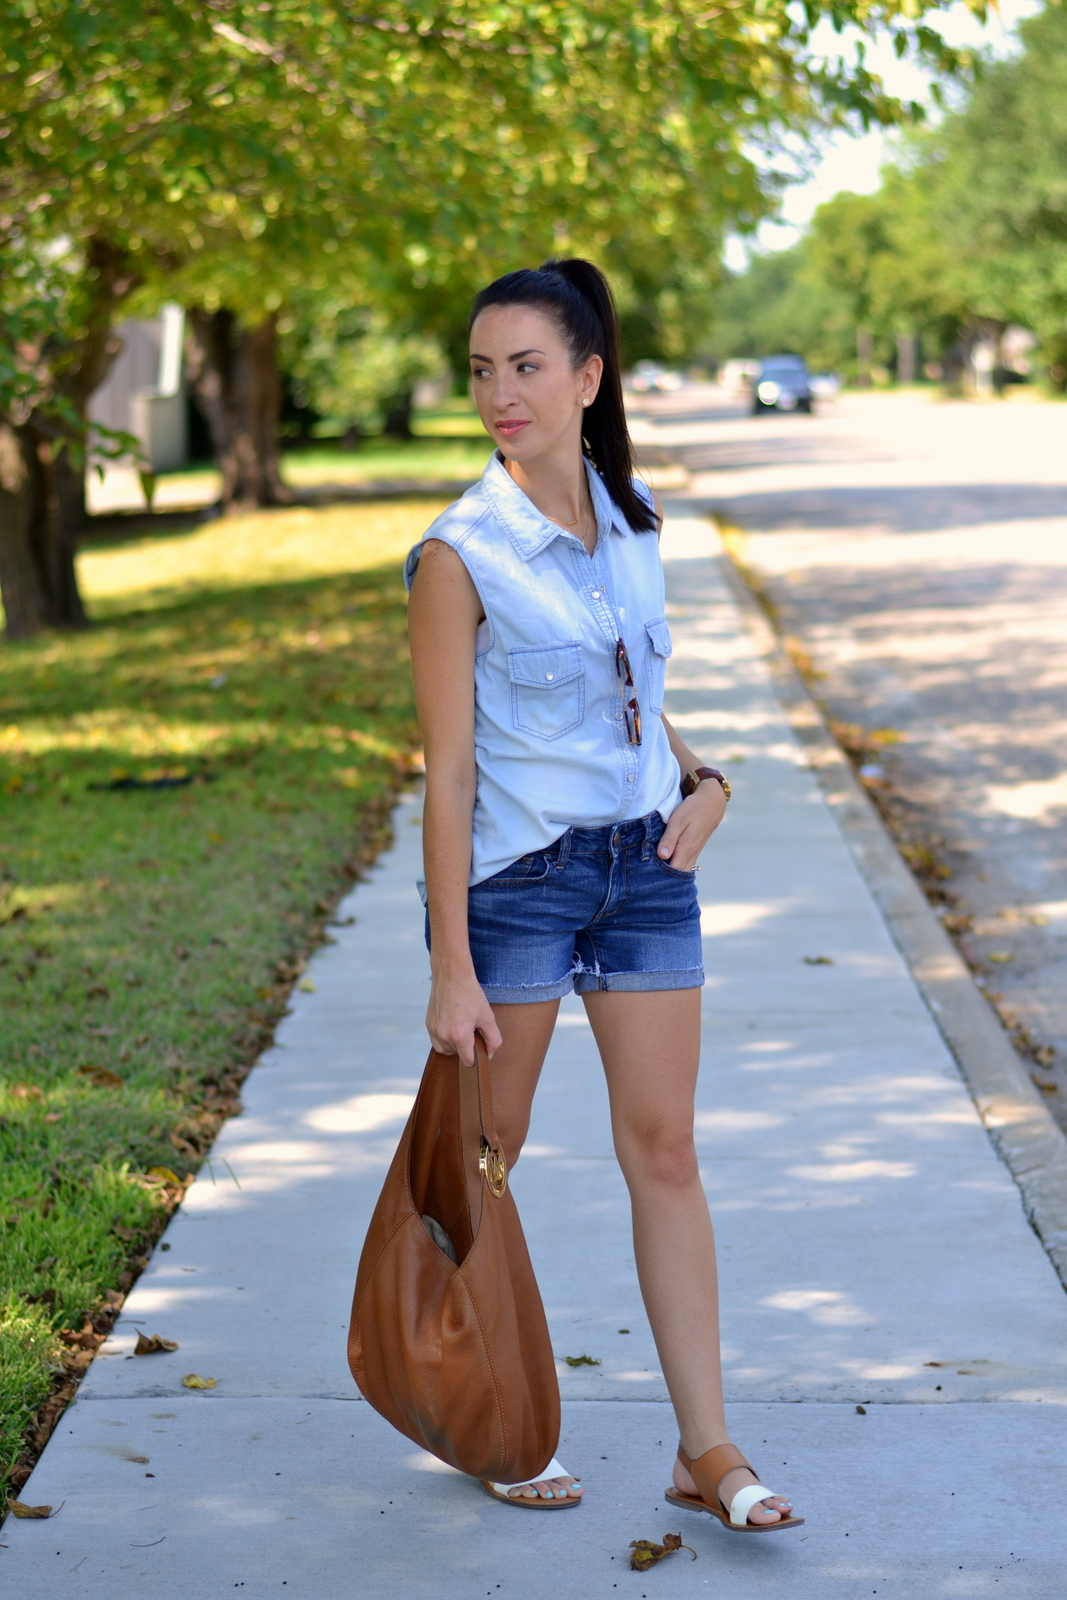 Denim Summer Outfit